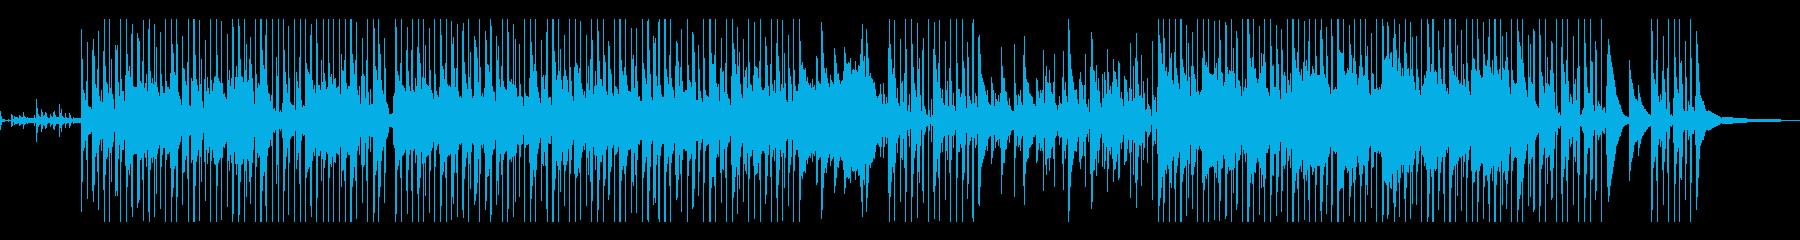 Lofi-Jazzhop chill チの再生済みの波形